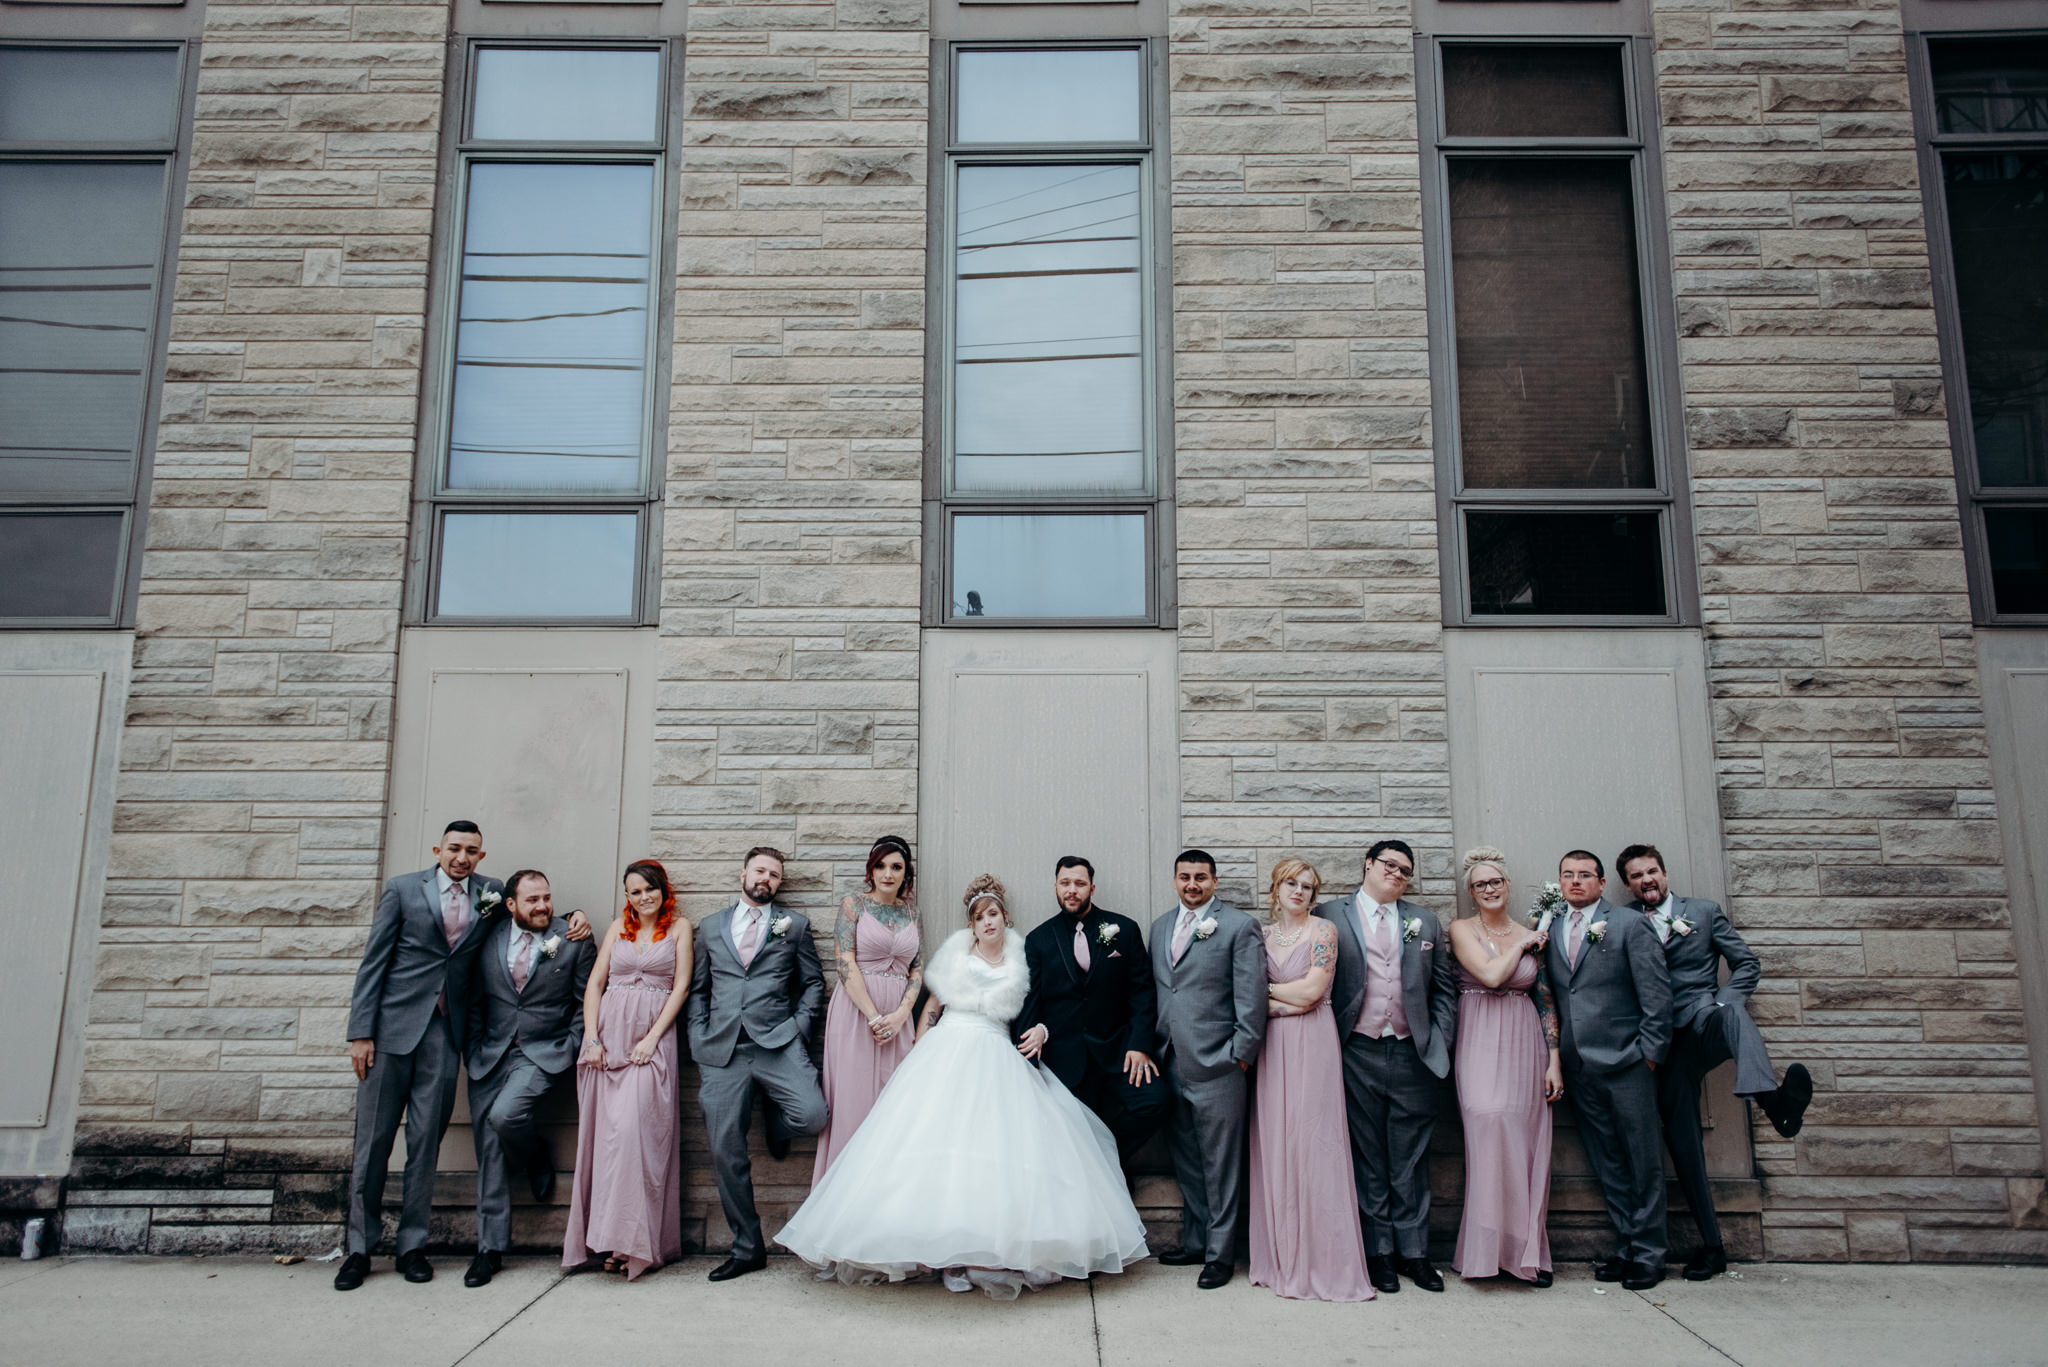 Grant Beachy Photo portrait wedding goshen elkhart south bend chicago-041.jpg